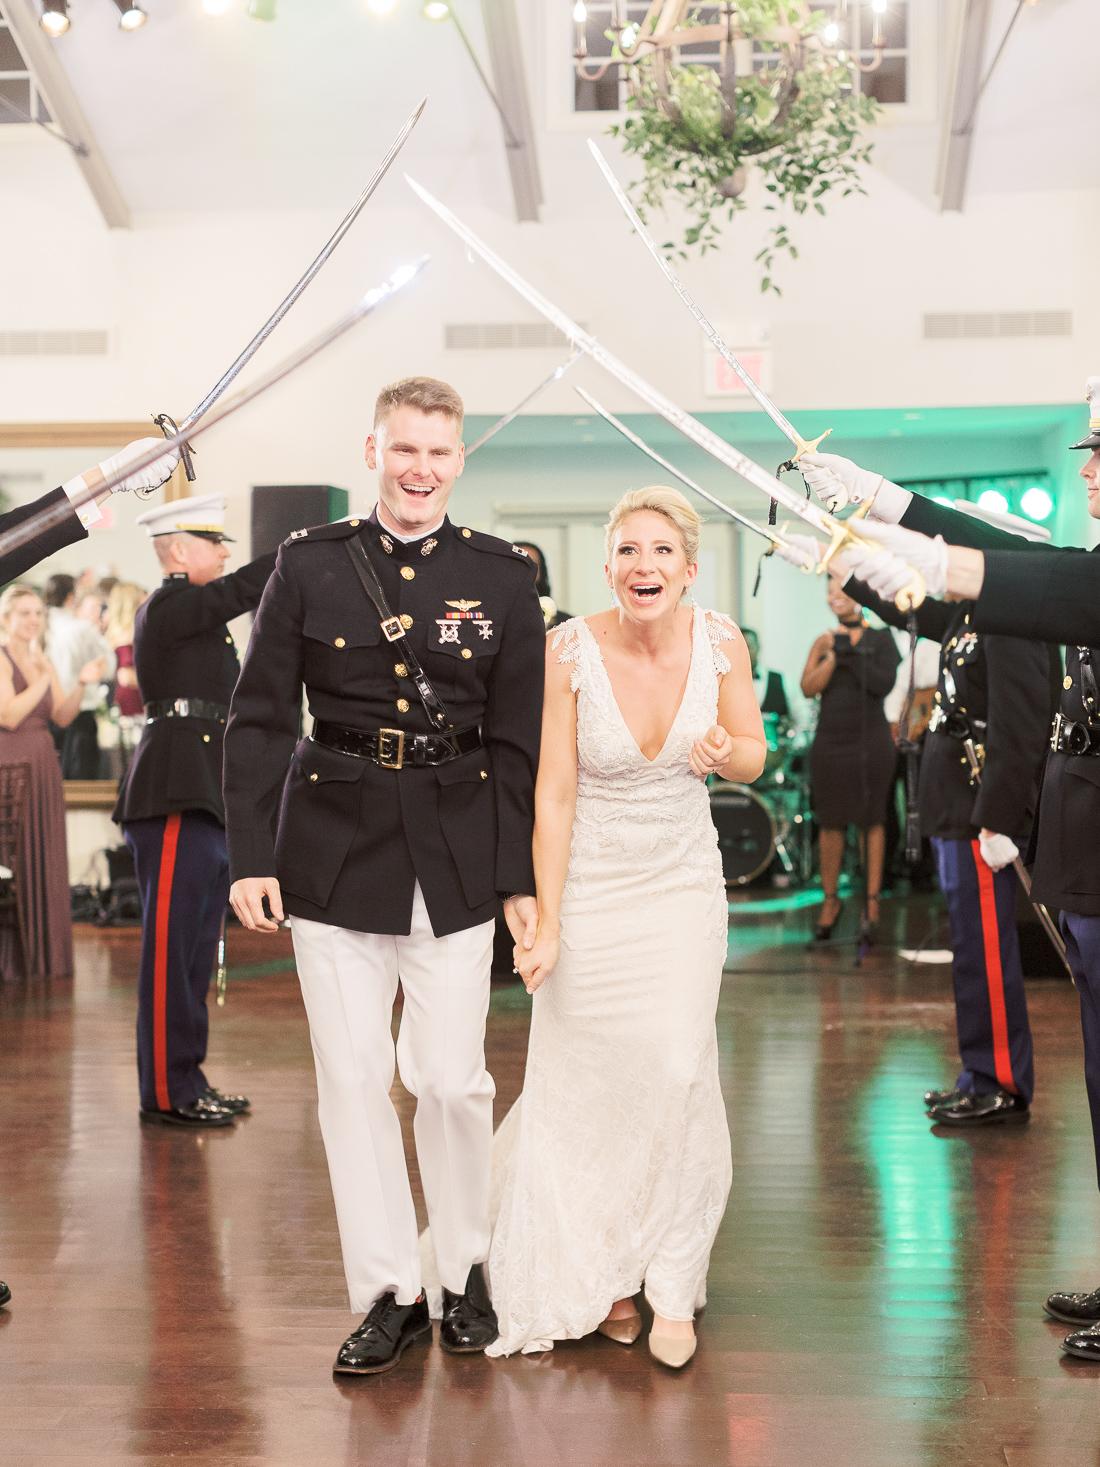 marine-wedding-sword-arch-ceremony-cute